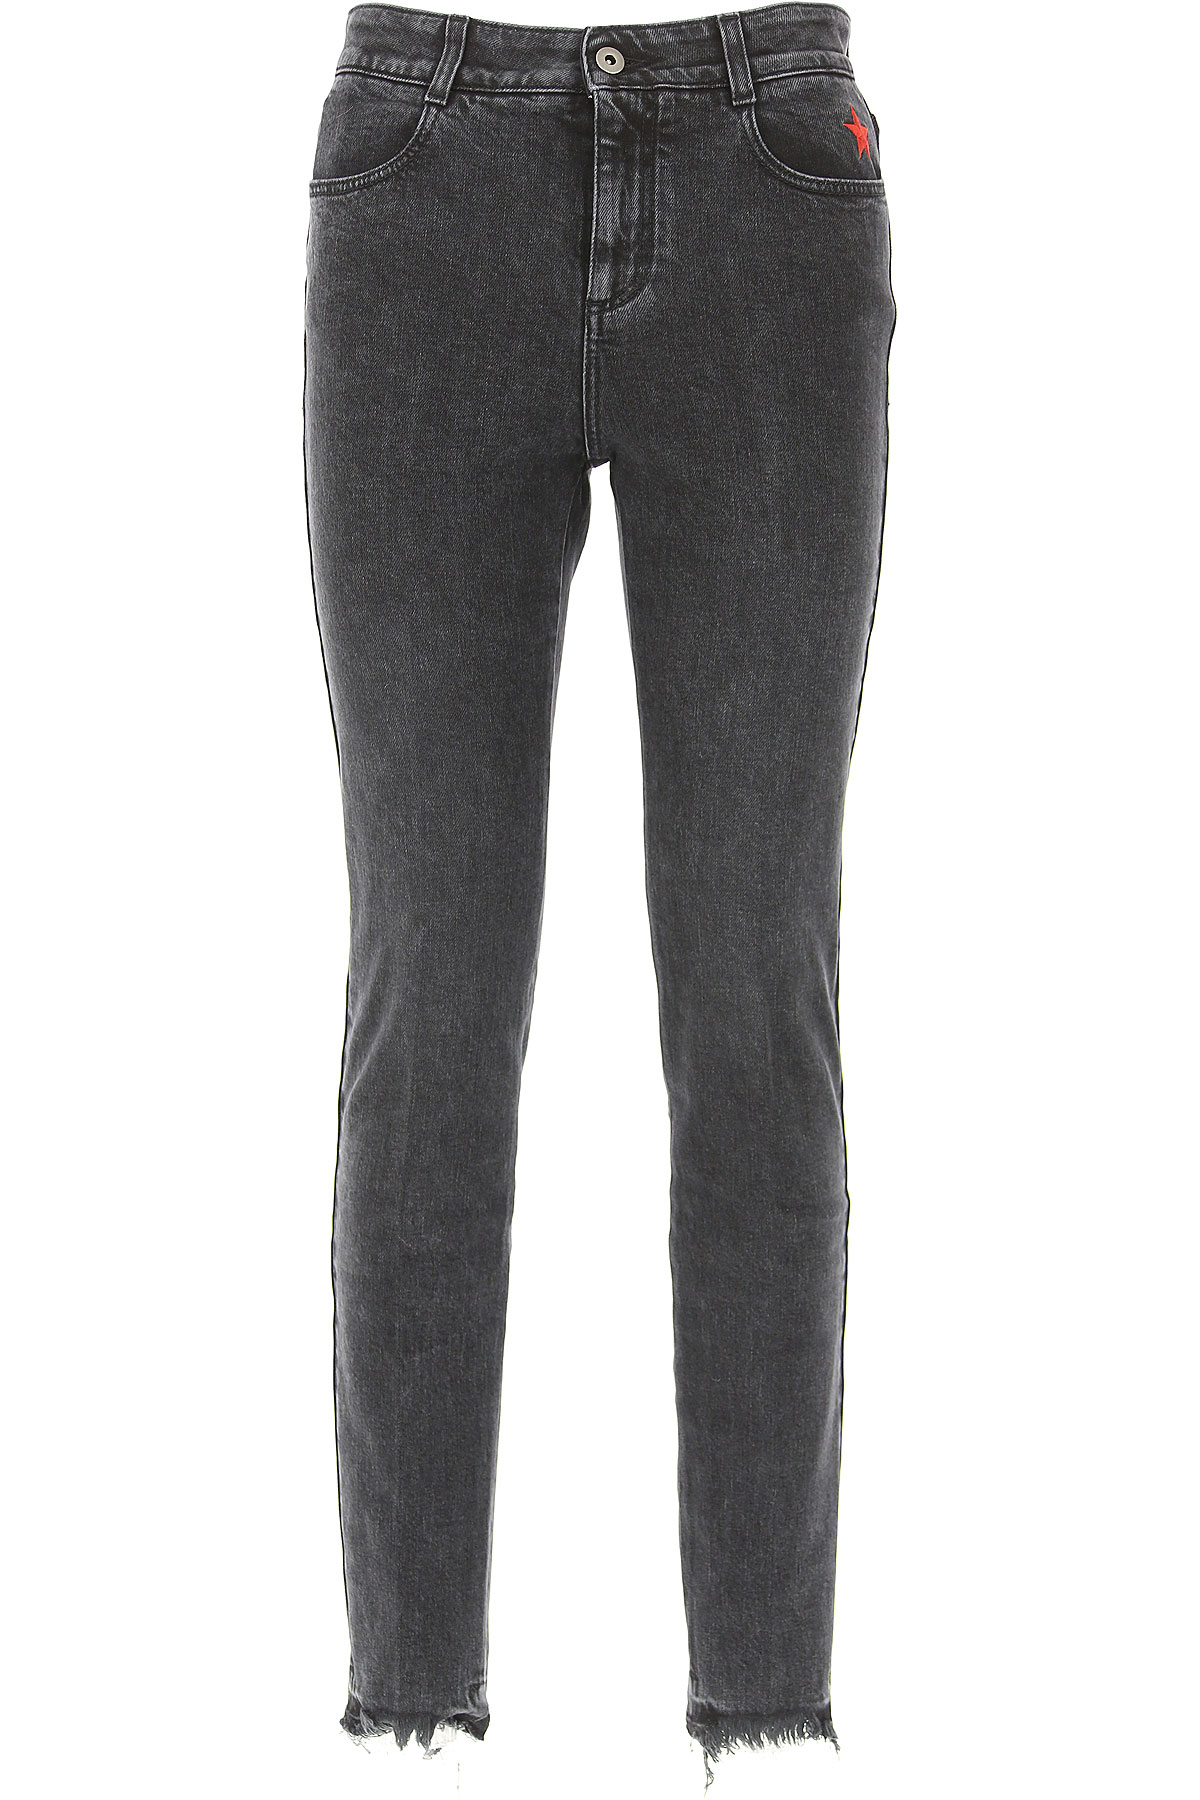 Stella McCartney Jeans On Sale, Washed Black, Cotton, 2017, 25 26 27 28 30